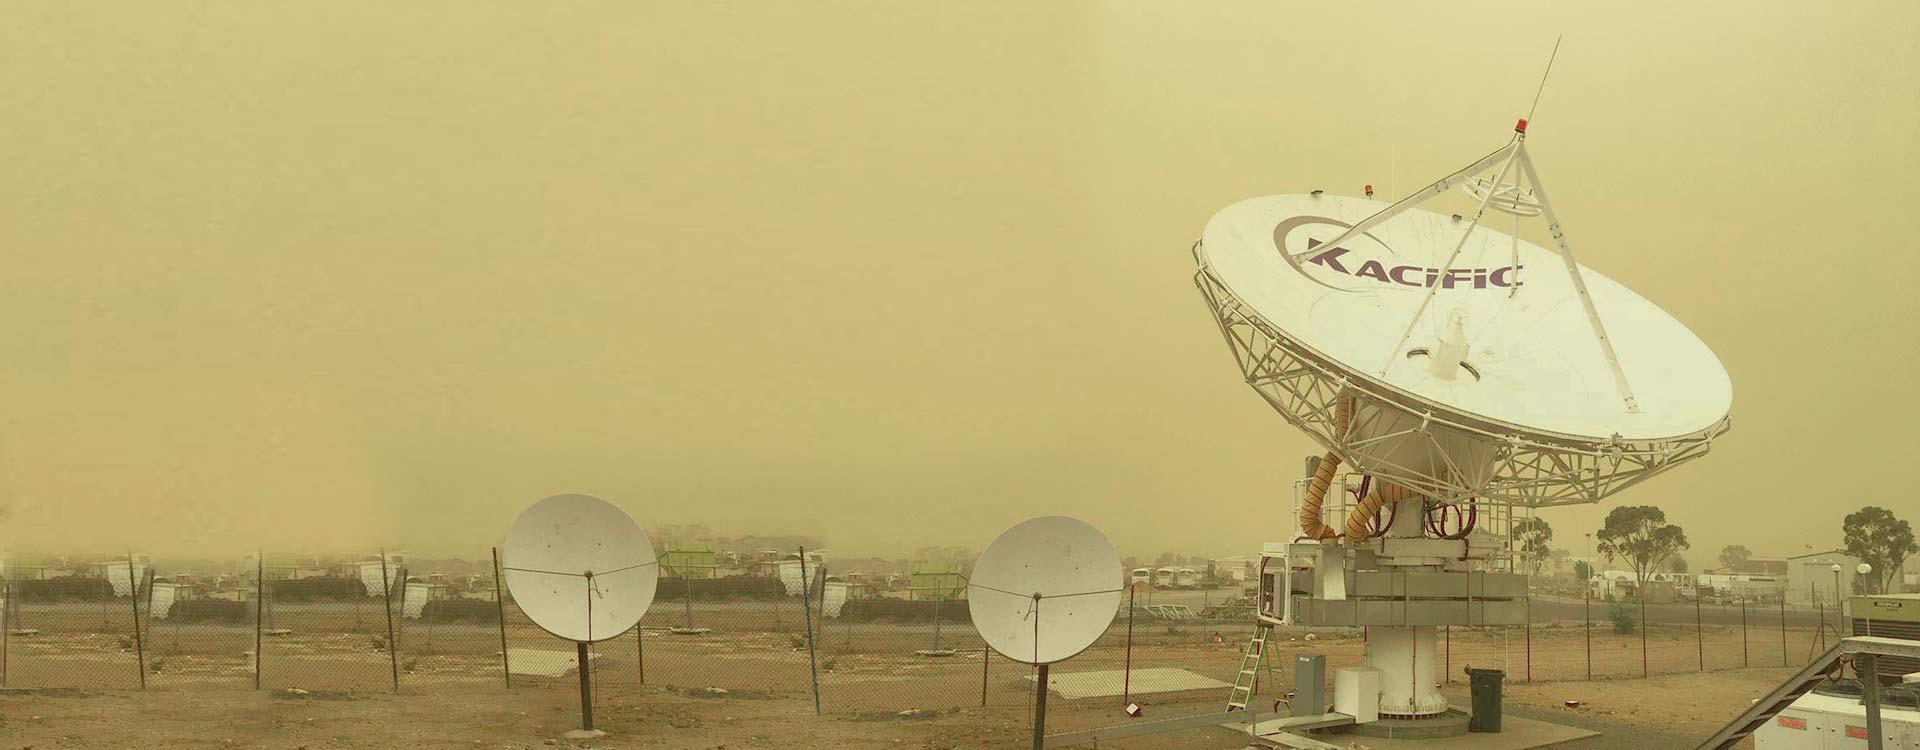 Kacific provide fast satellite internet in pacific